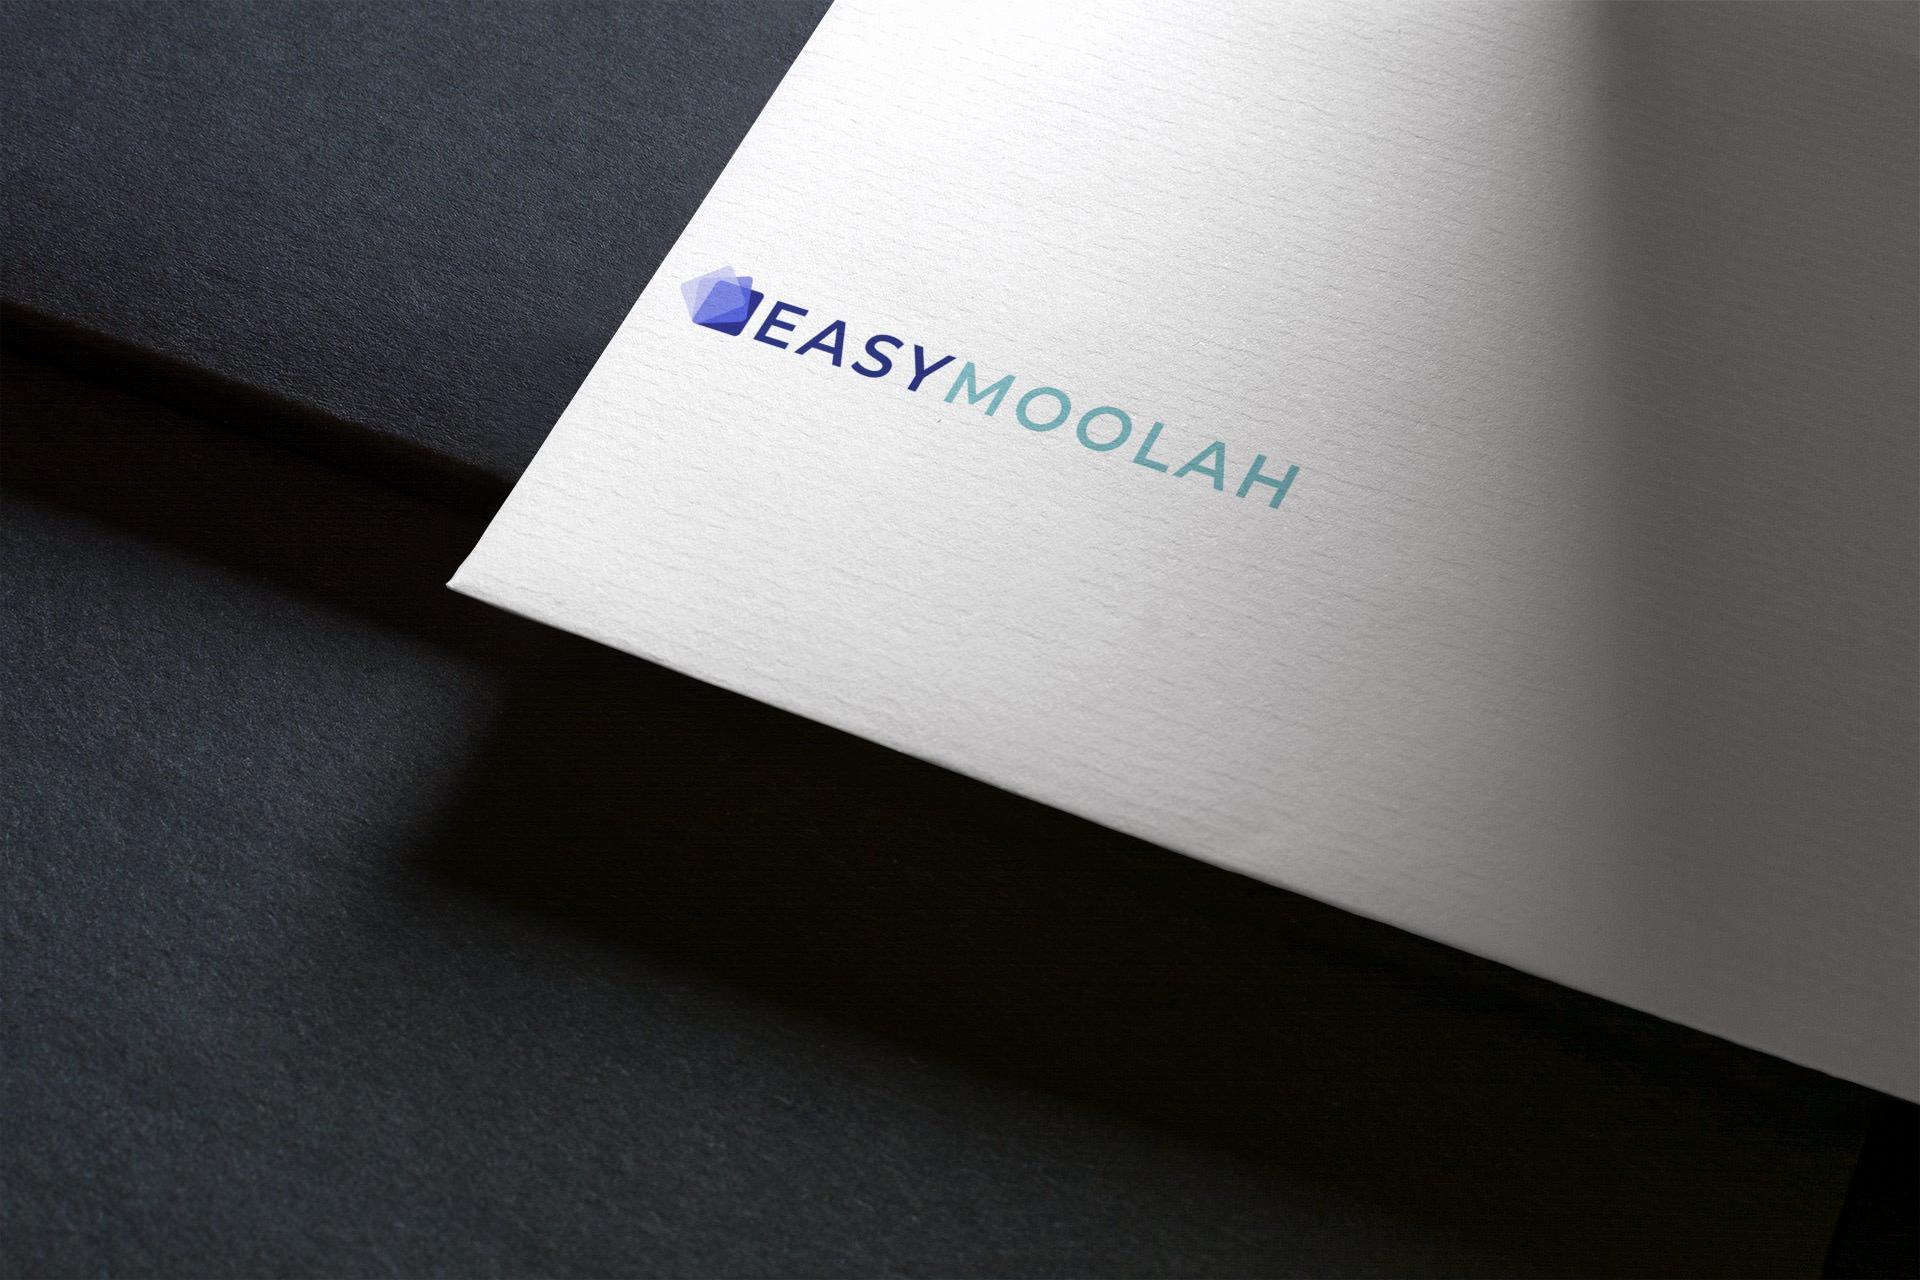 EasyMoolah Corporate Identity | KEMOSO